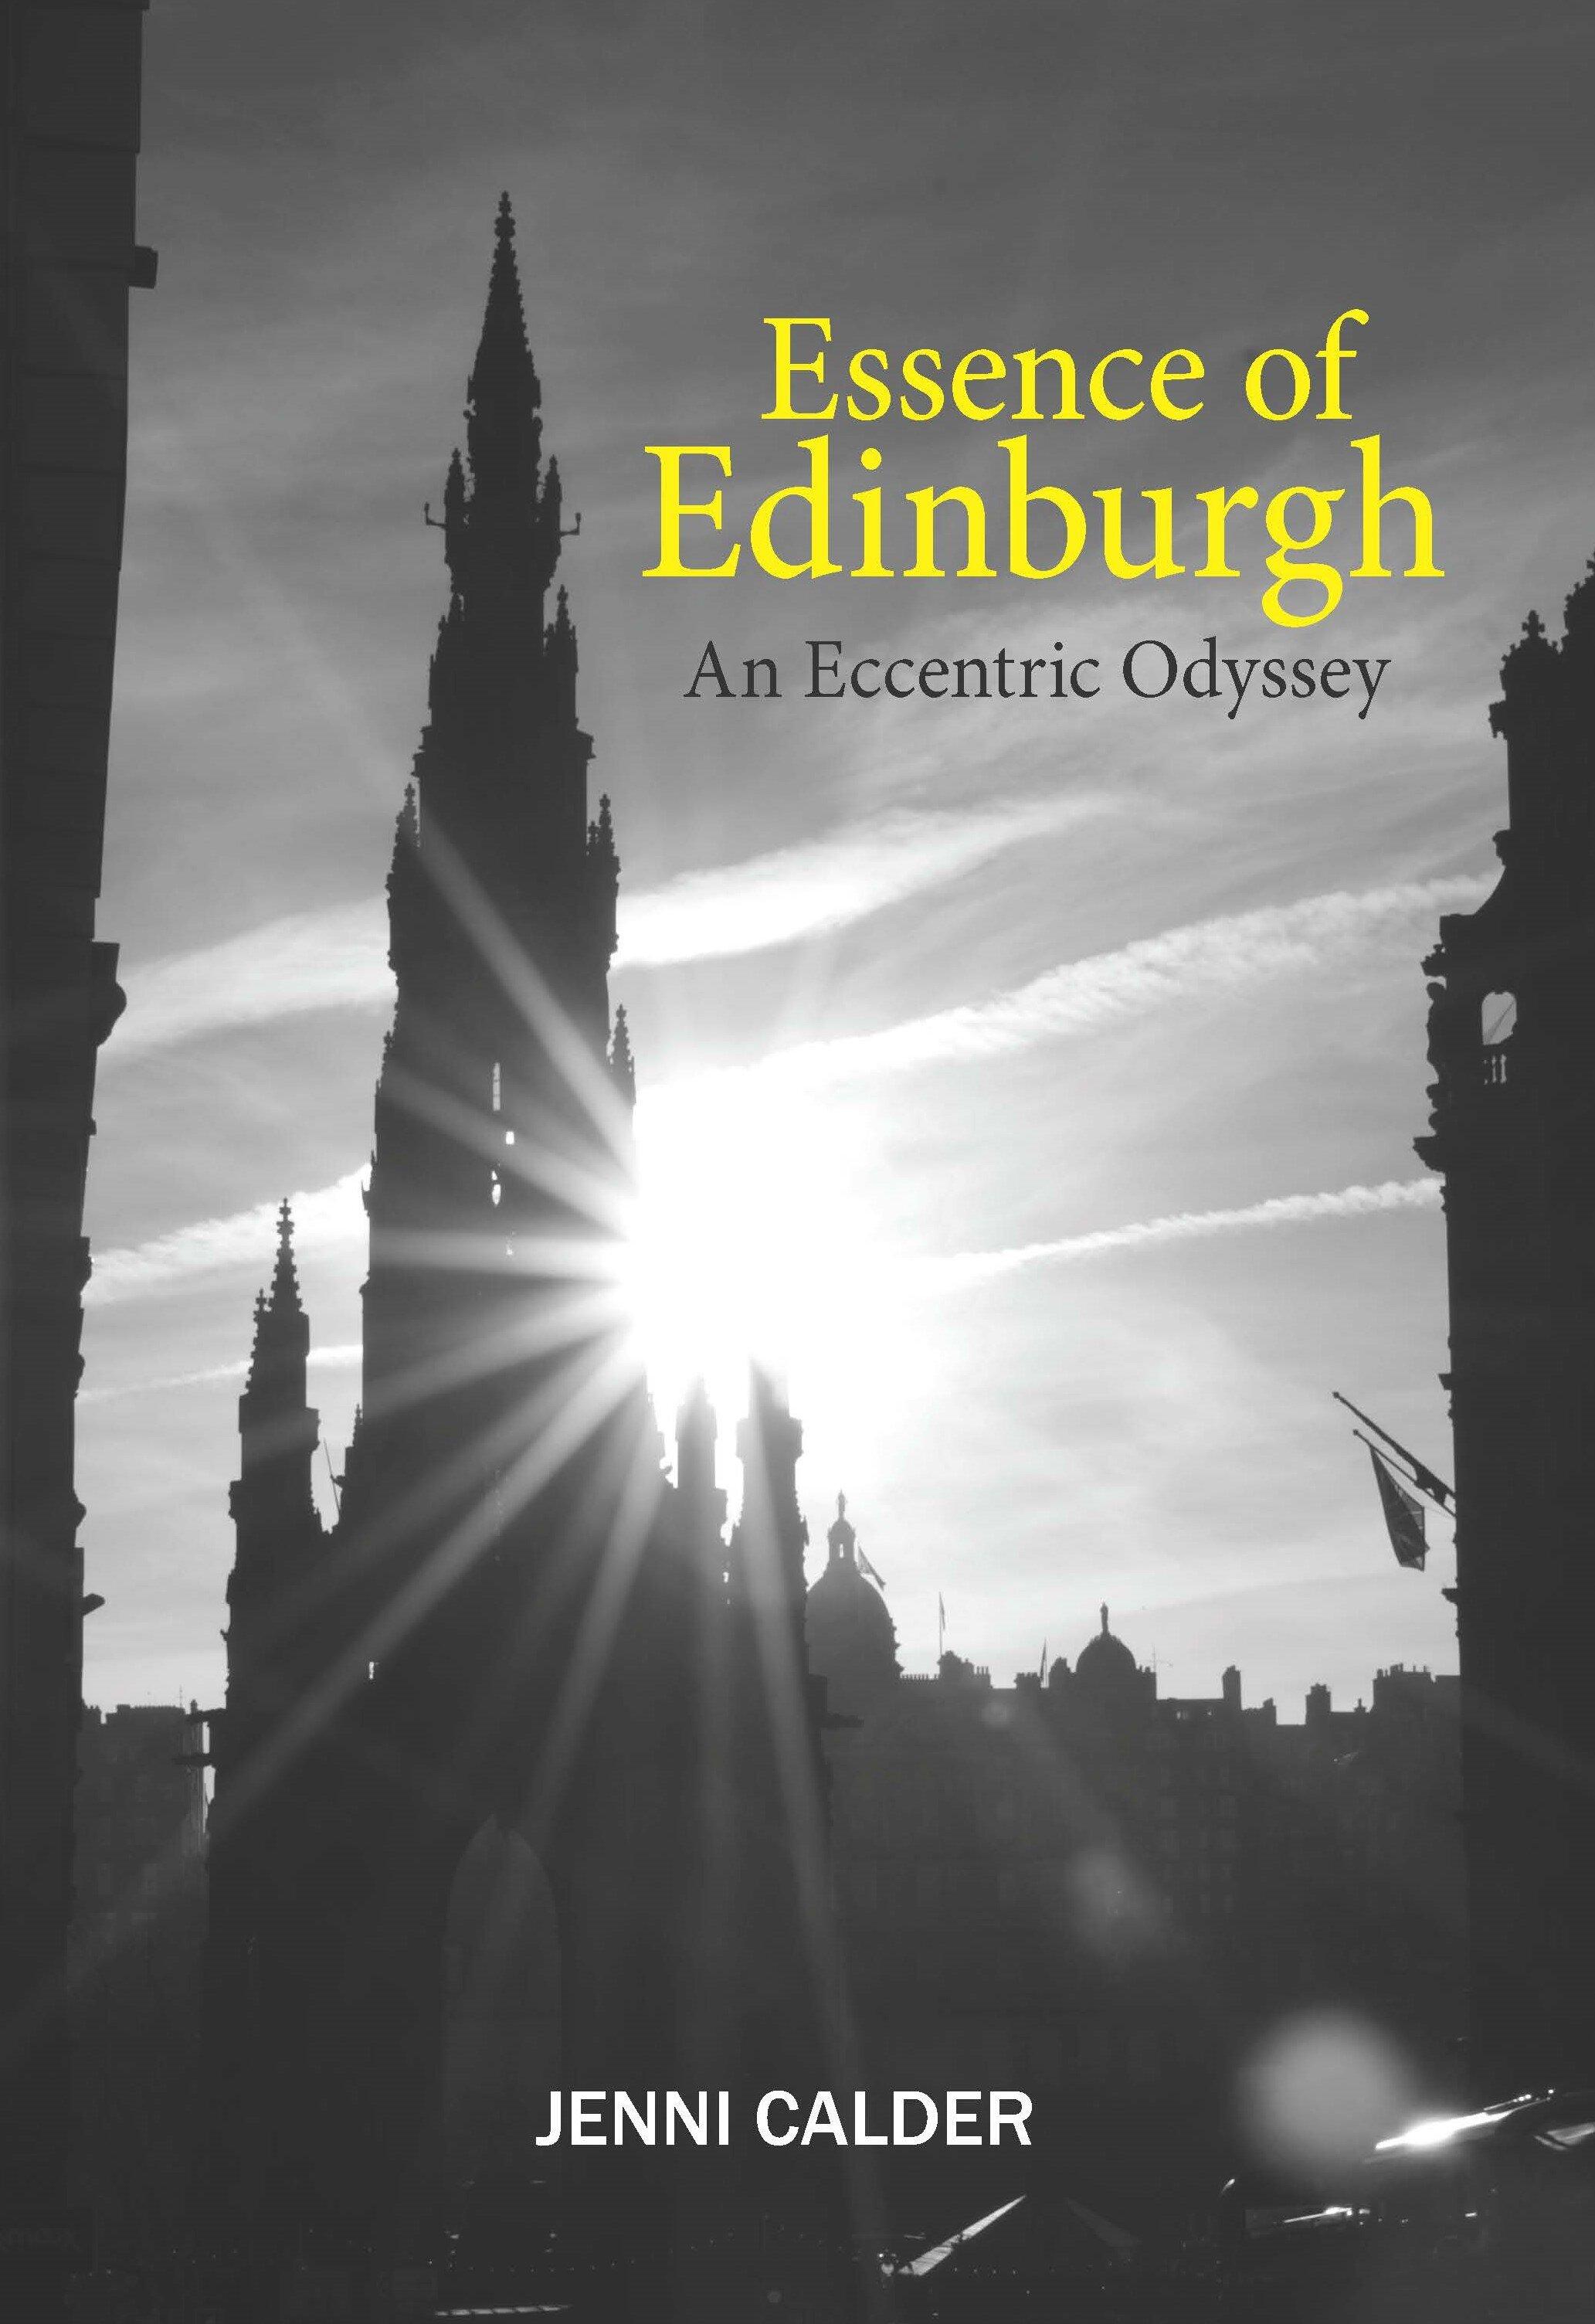 Essence of Edinburgh Jenni Calder 9781912147540 Luath Press.jpg